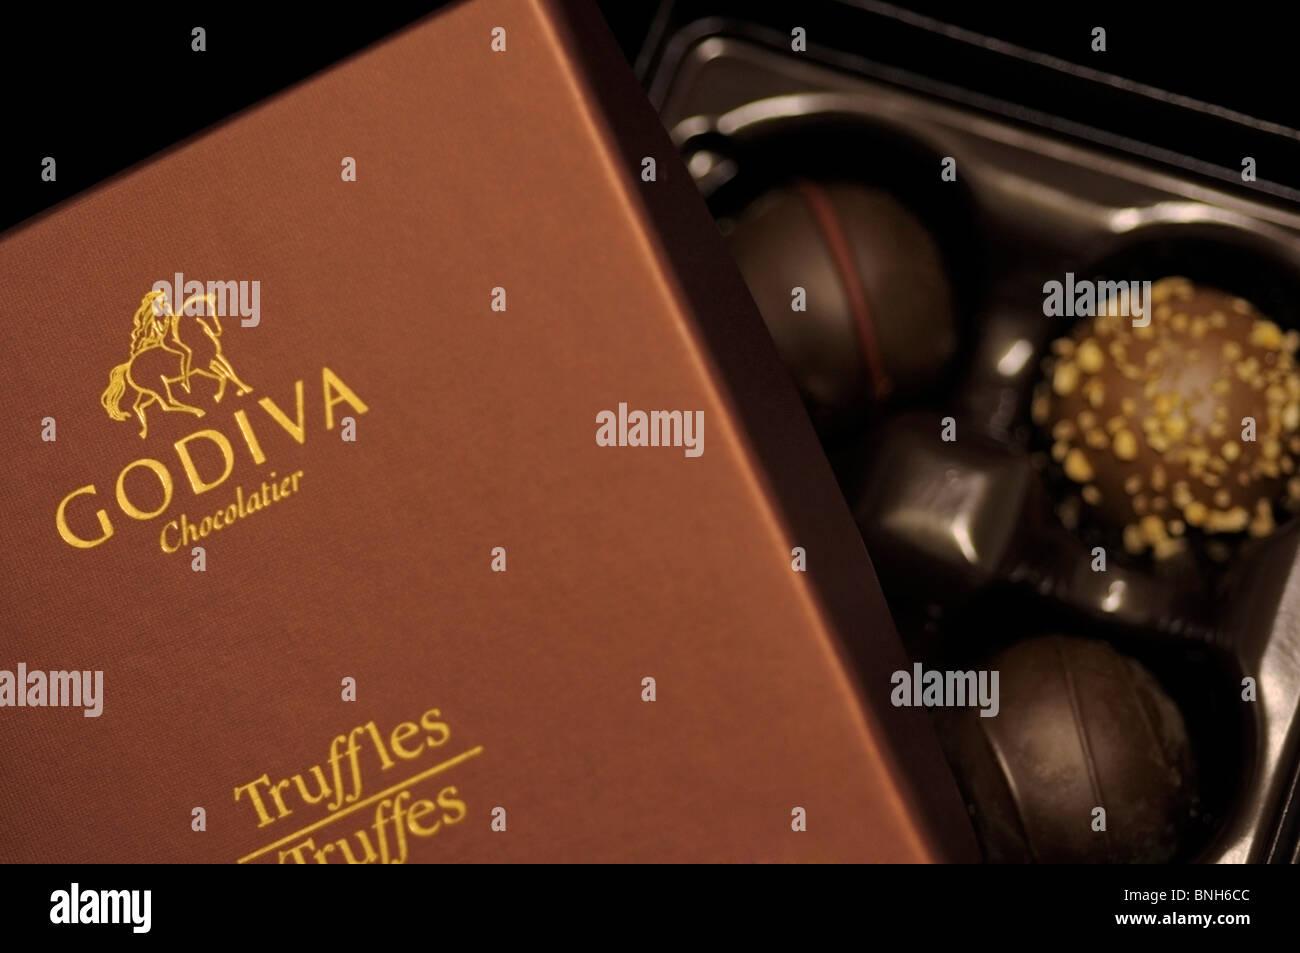 Box of Truffles - Stock Image